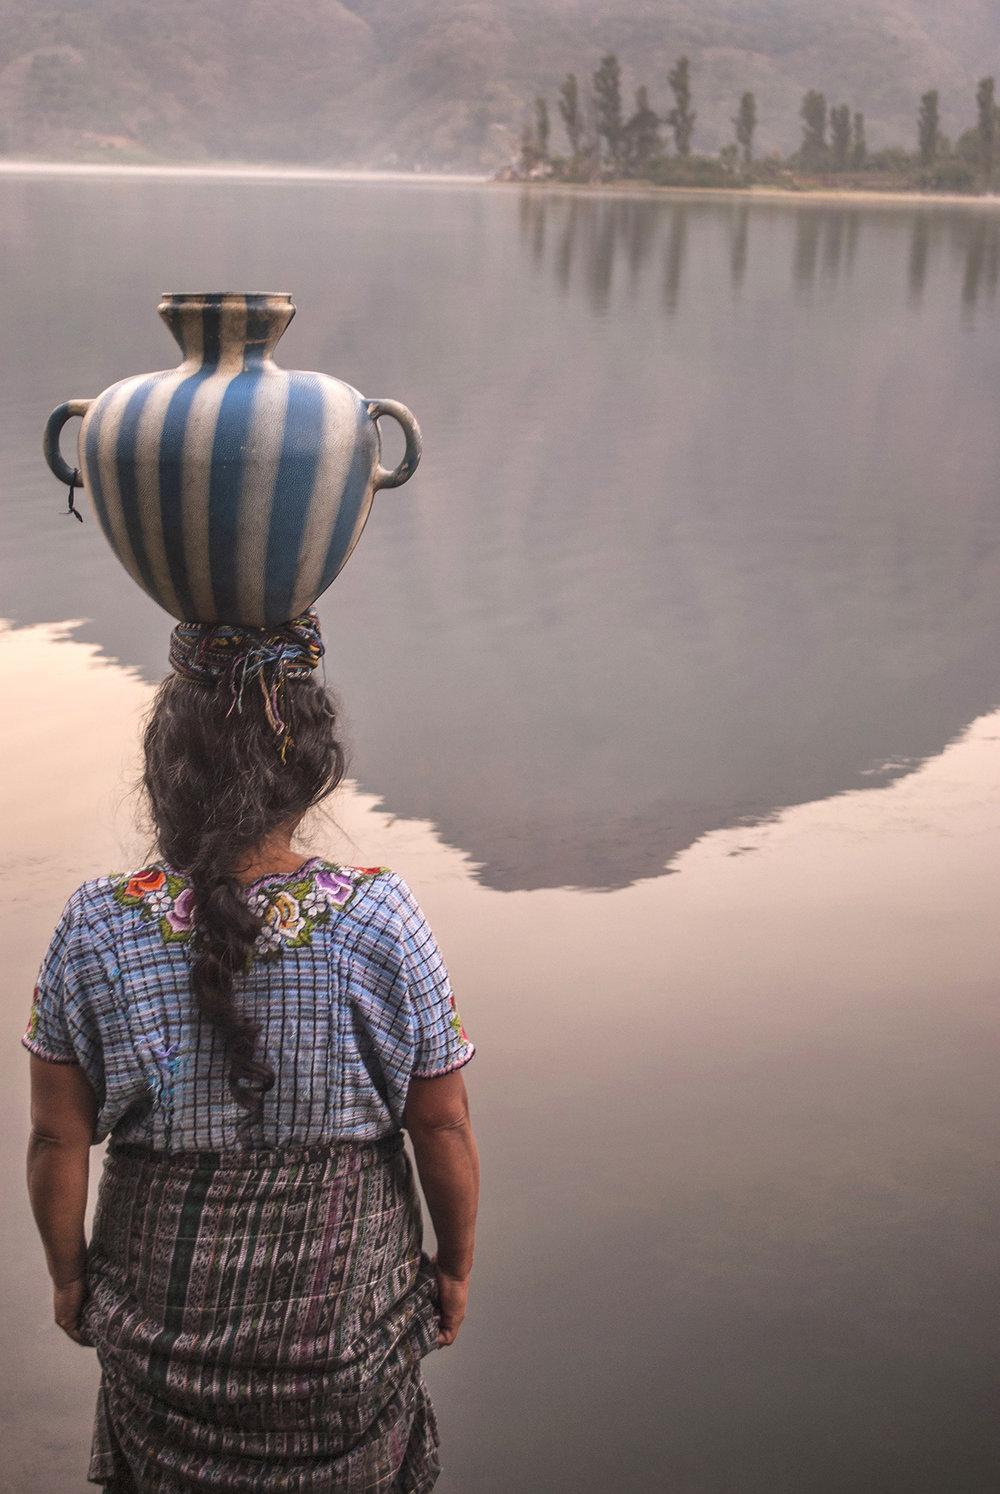 Chonita Robinal, 16-years-old © Chonita Robinal / Fotokids Guatemala